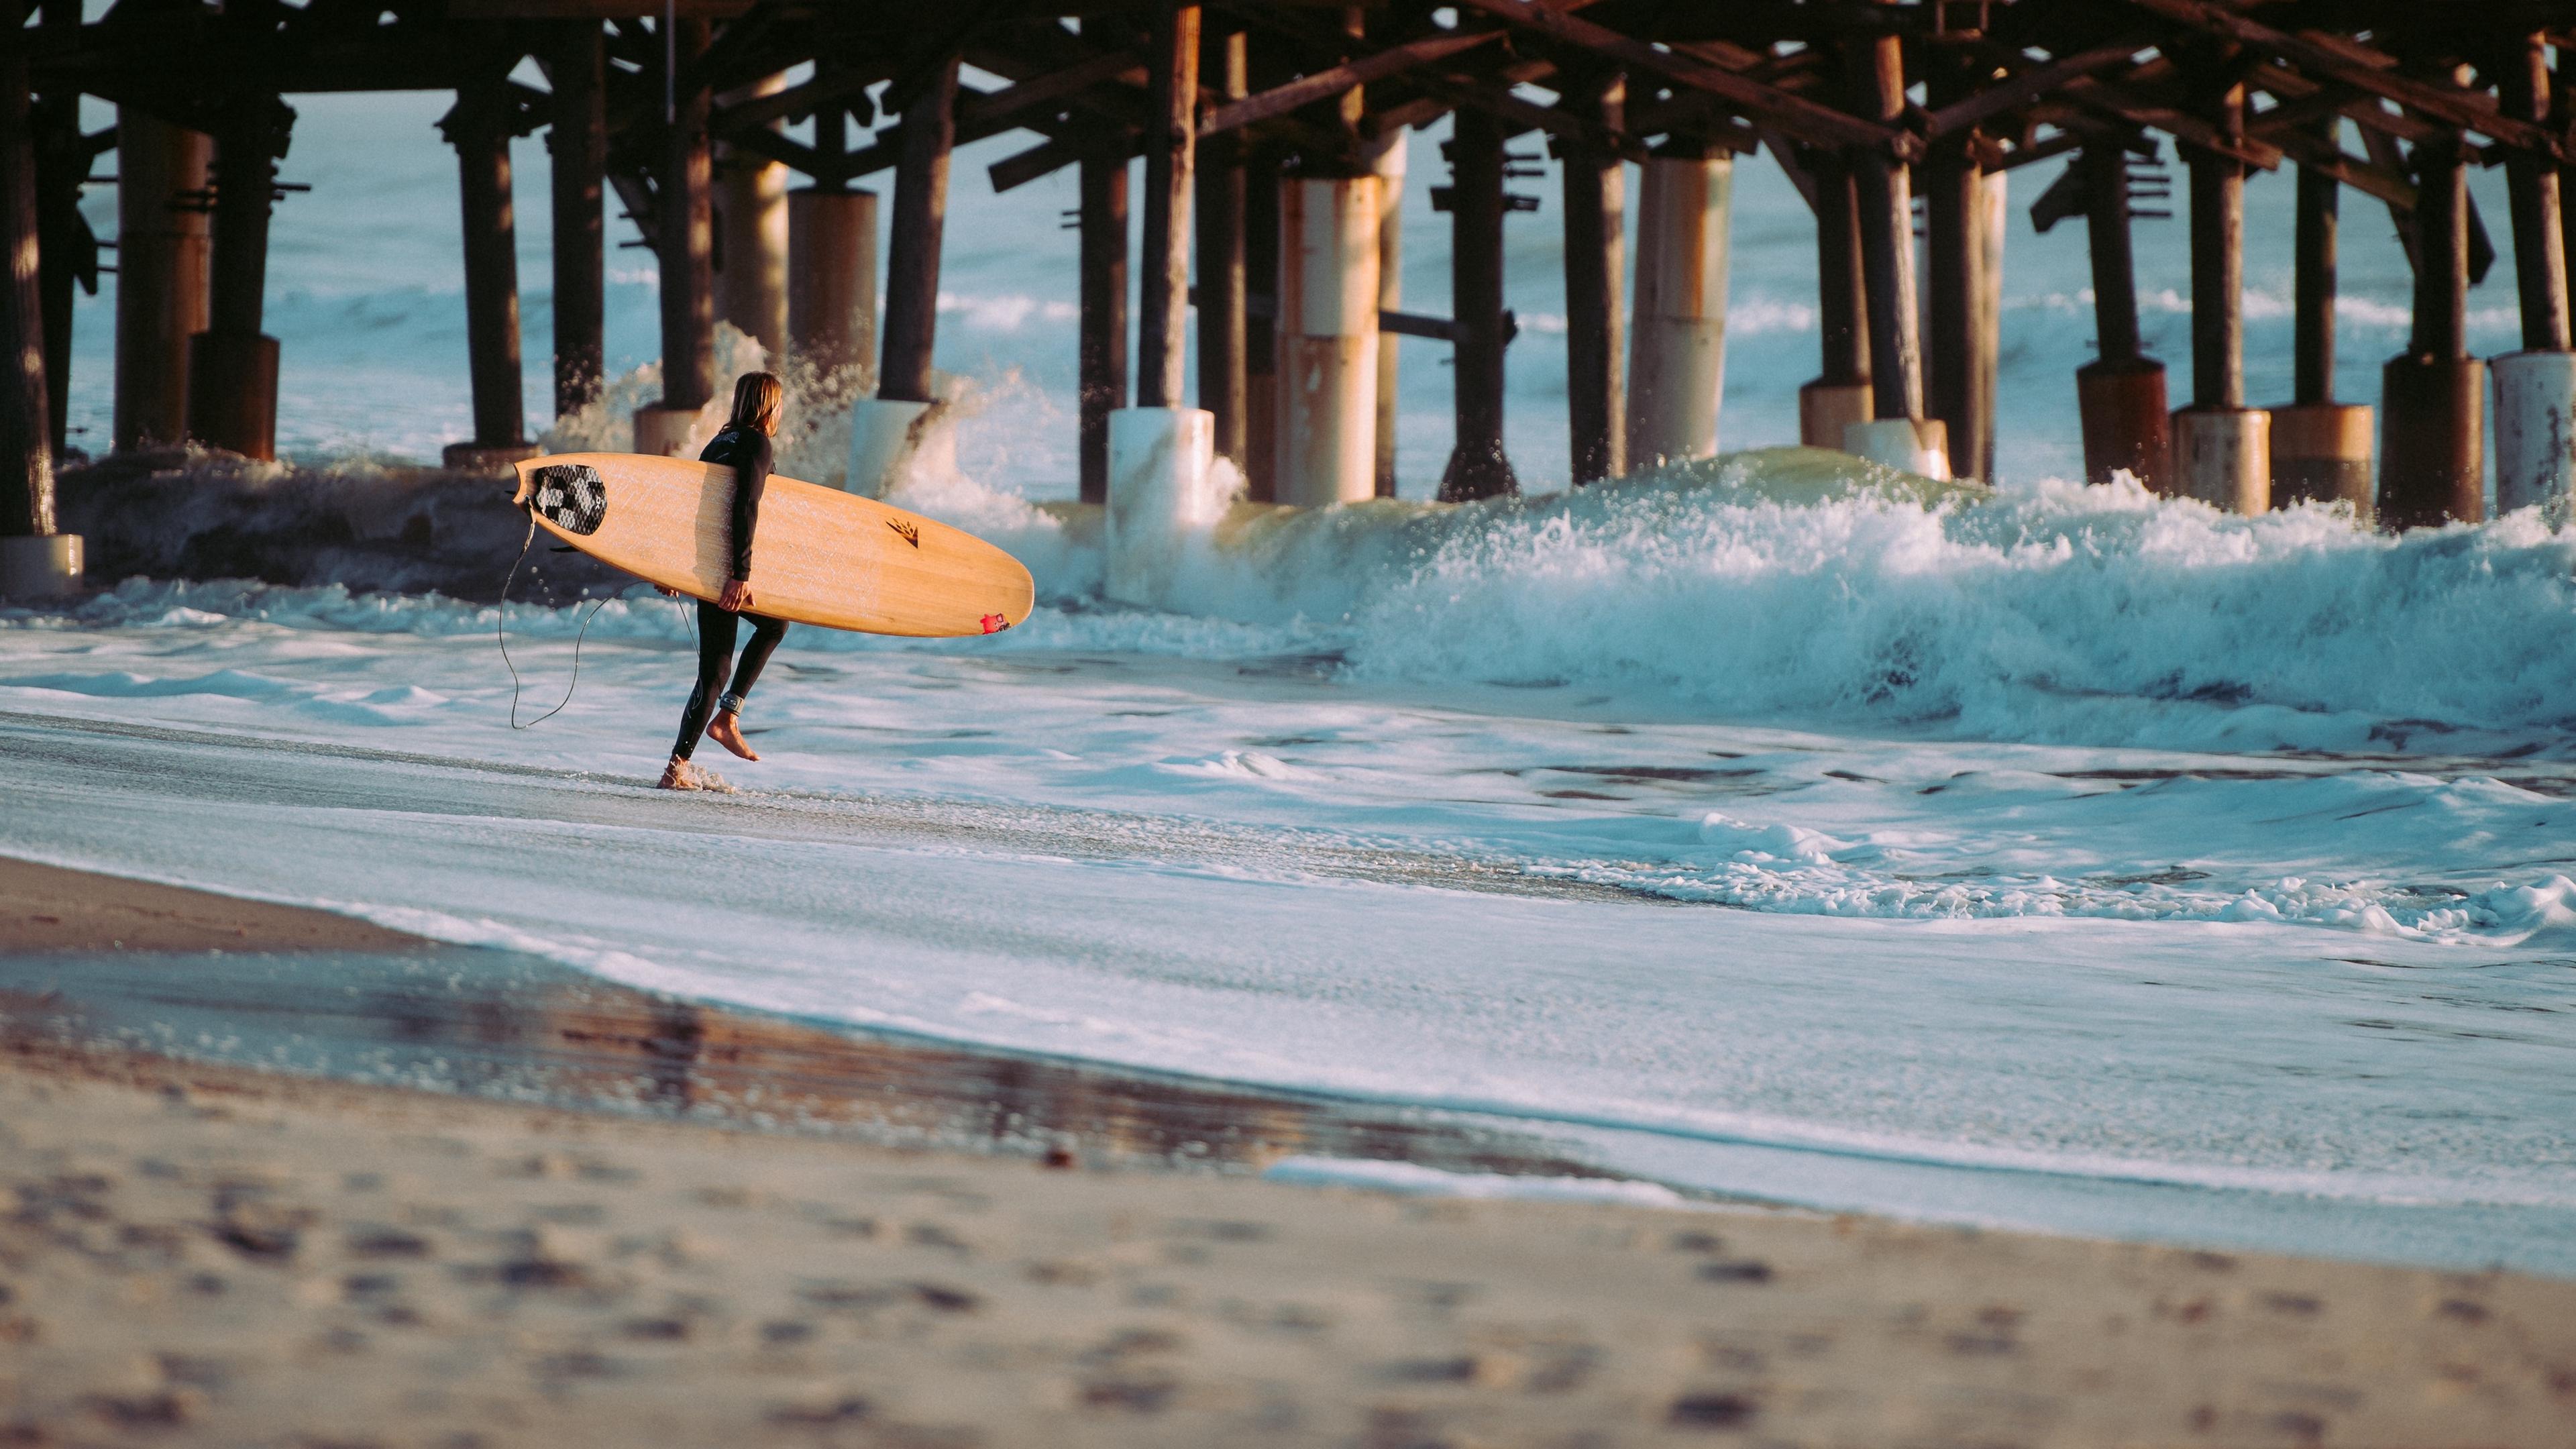 surfing surfer sea waves 4k 1540061546 - surfing, surfer, sea, waves 4k - Surfing, Surfer, Sea